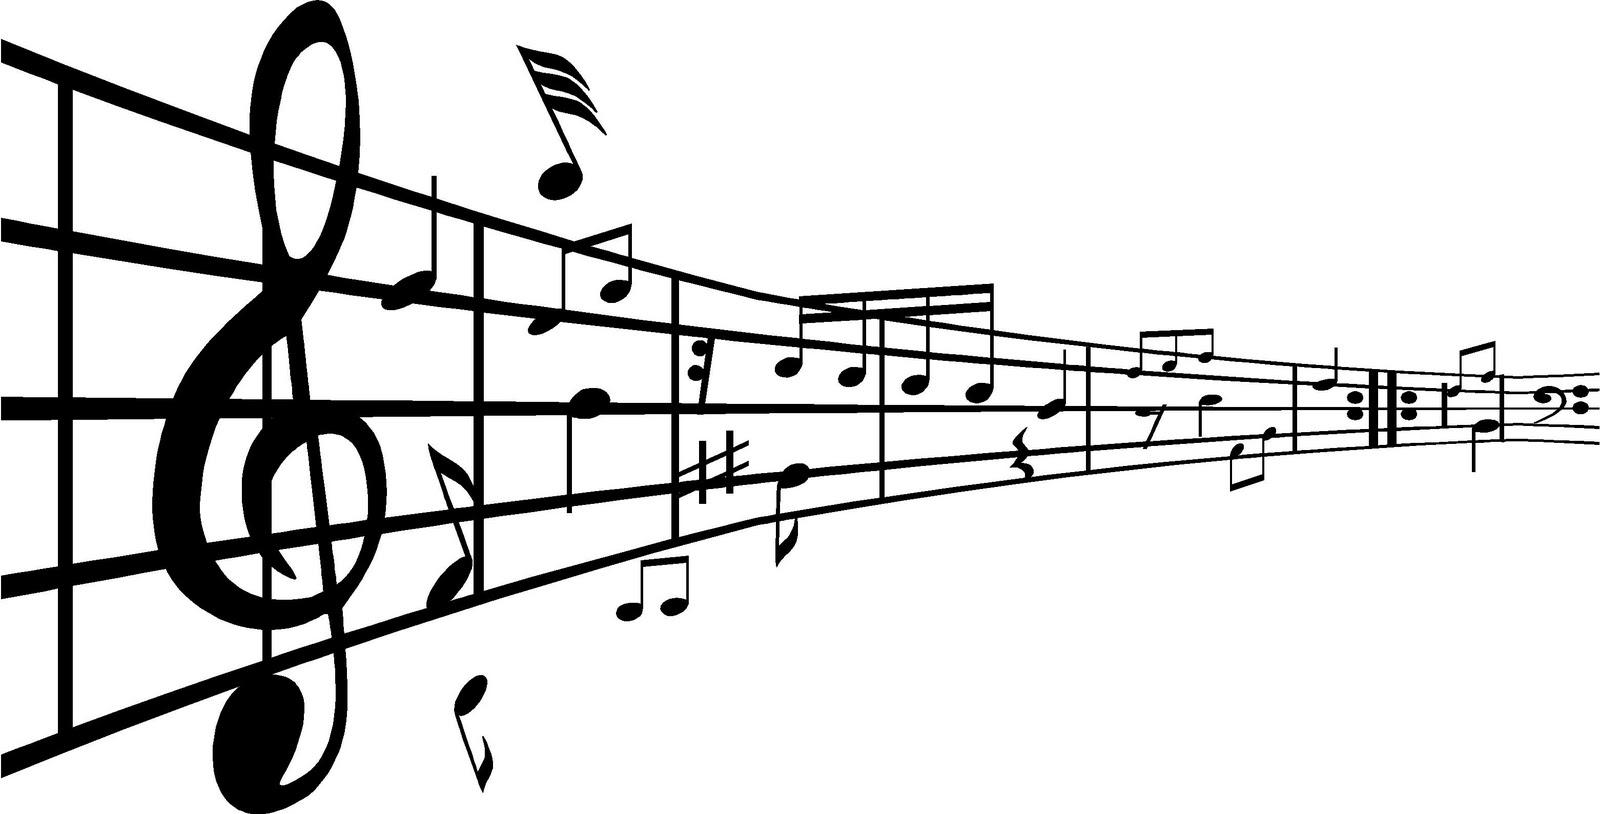 letras de musicas de grupos: